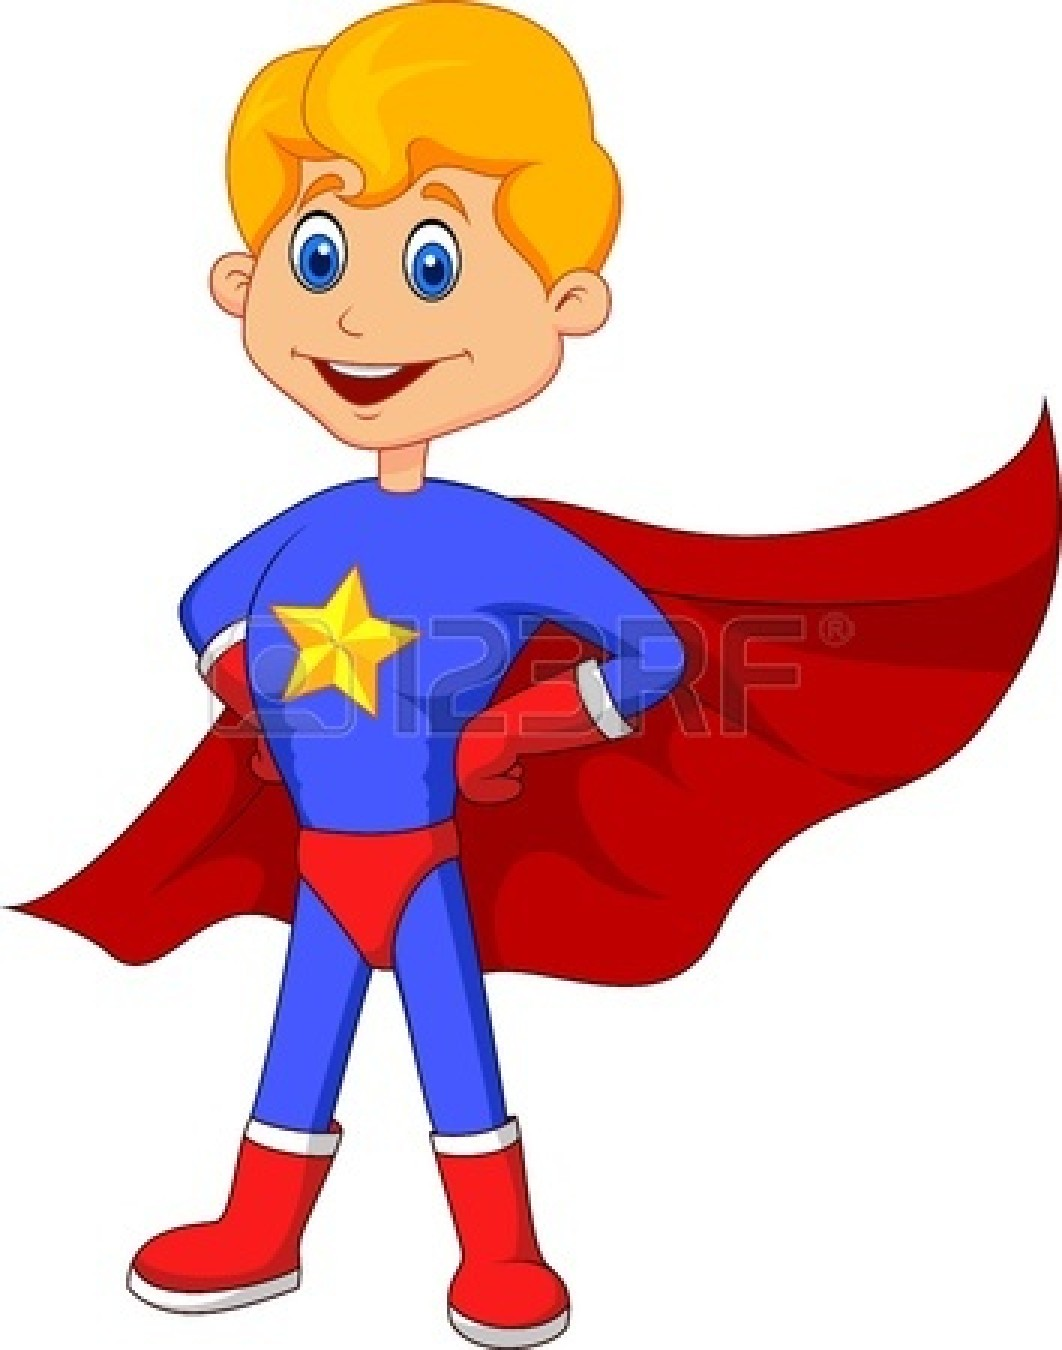 Hero Cartoon Clipart - Clipart Kid